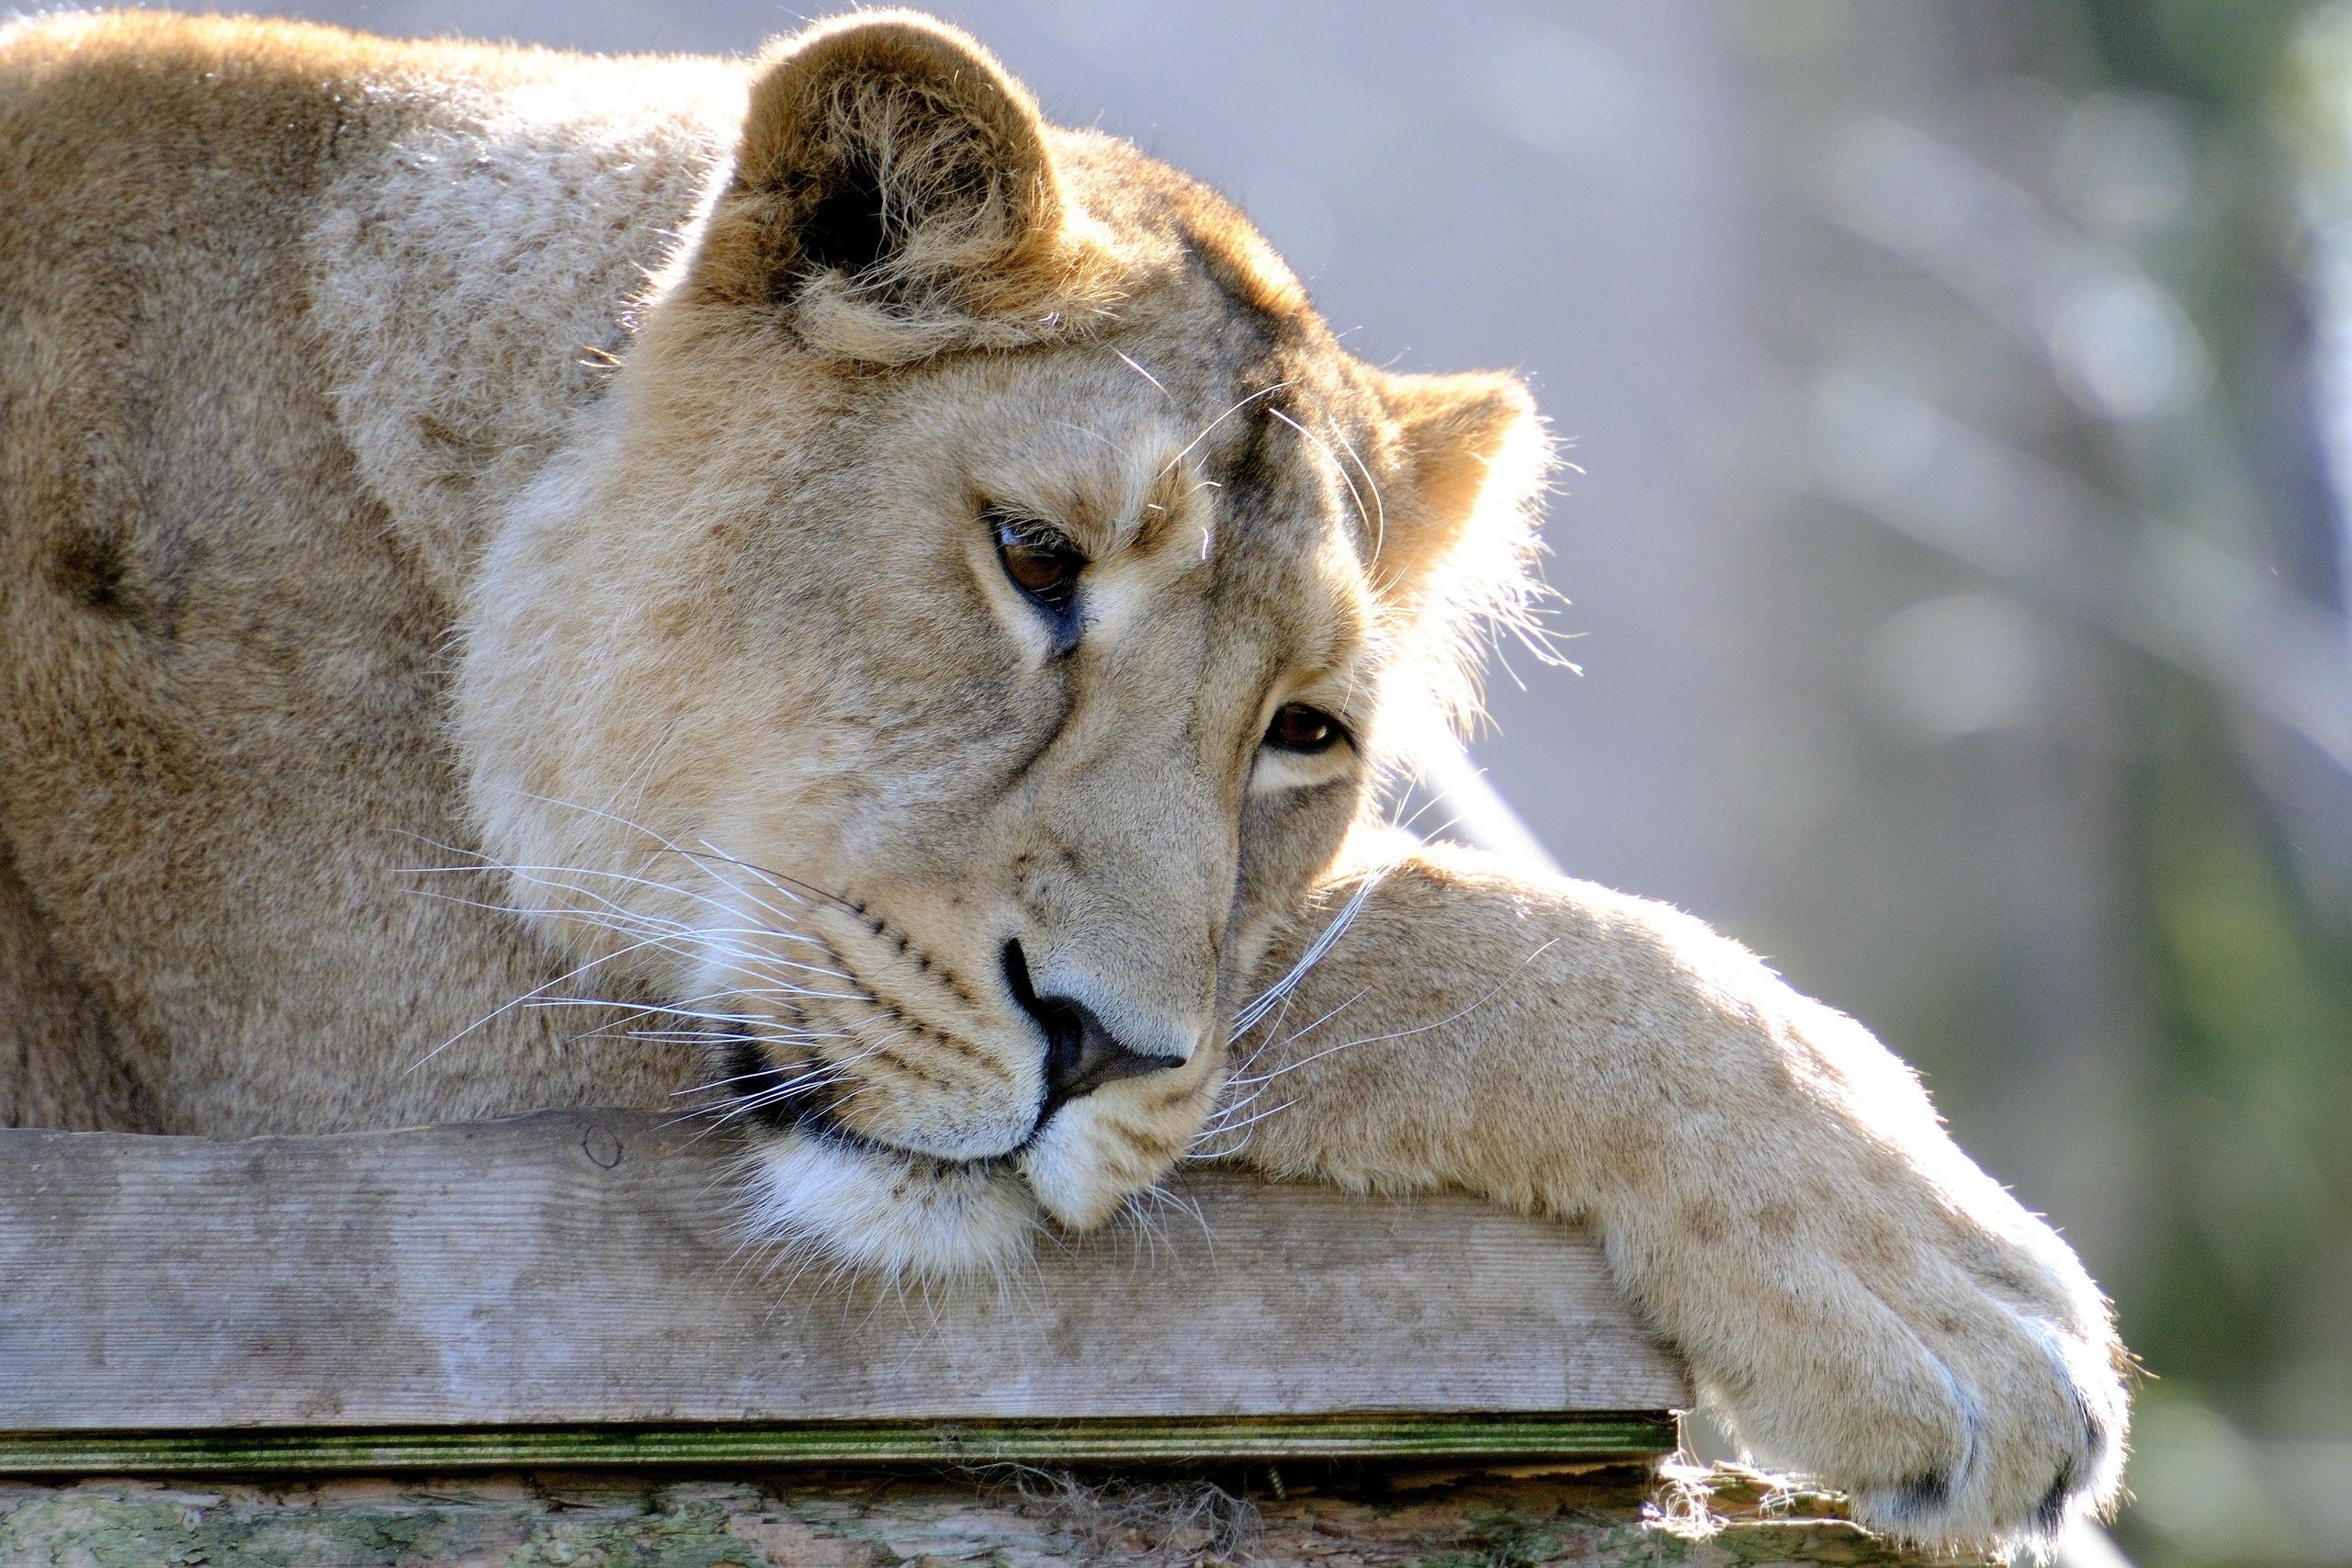 Картинка обиженный лев